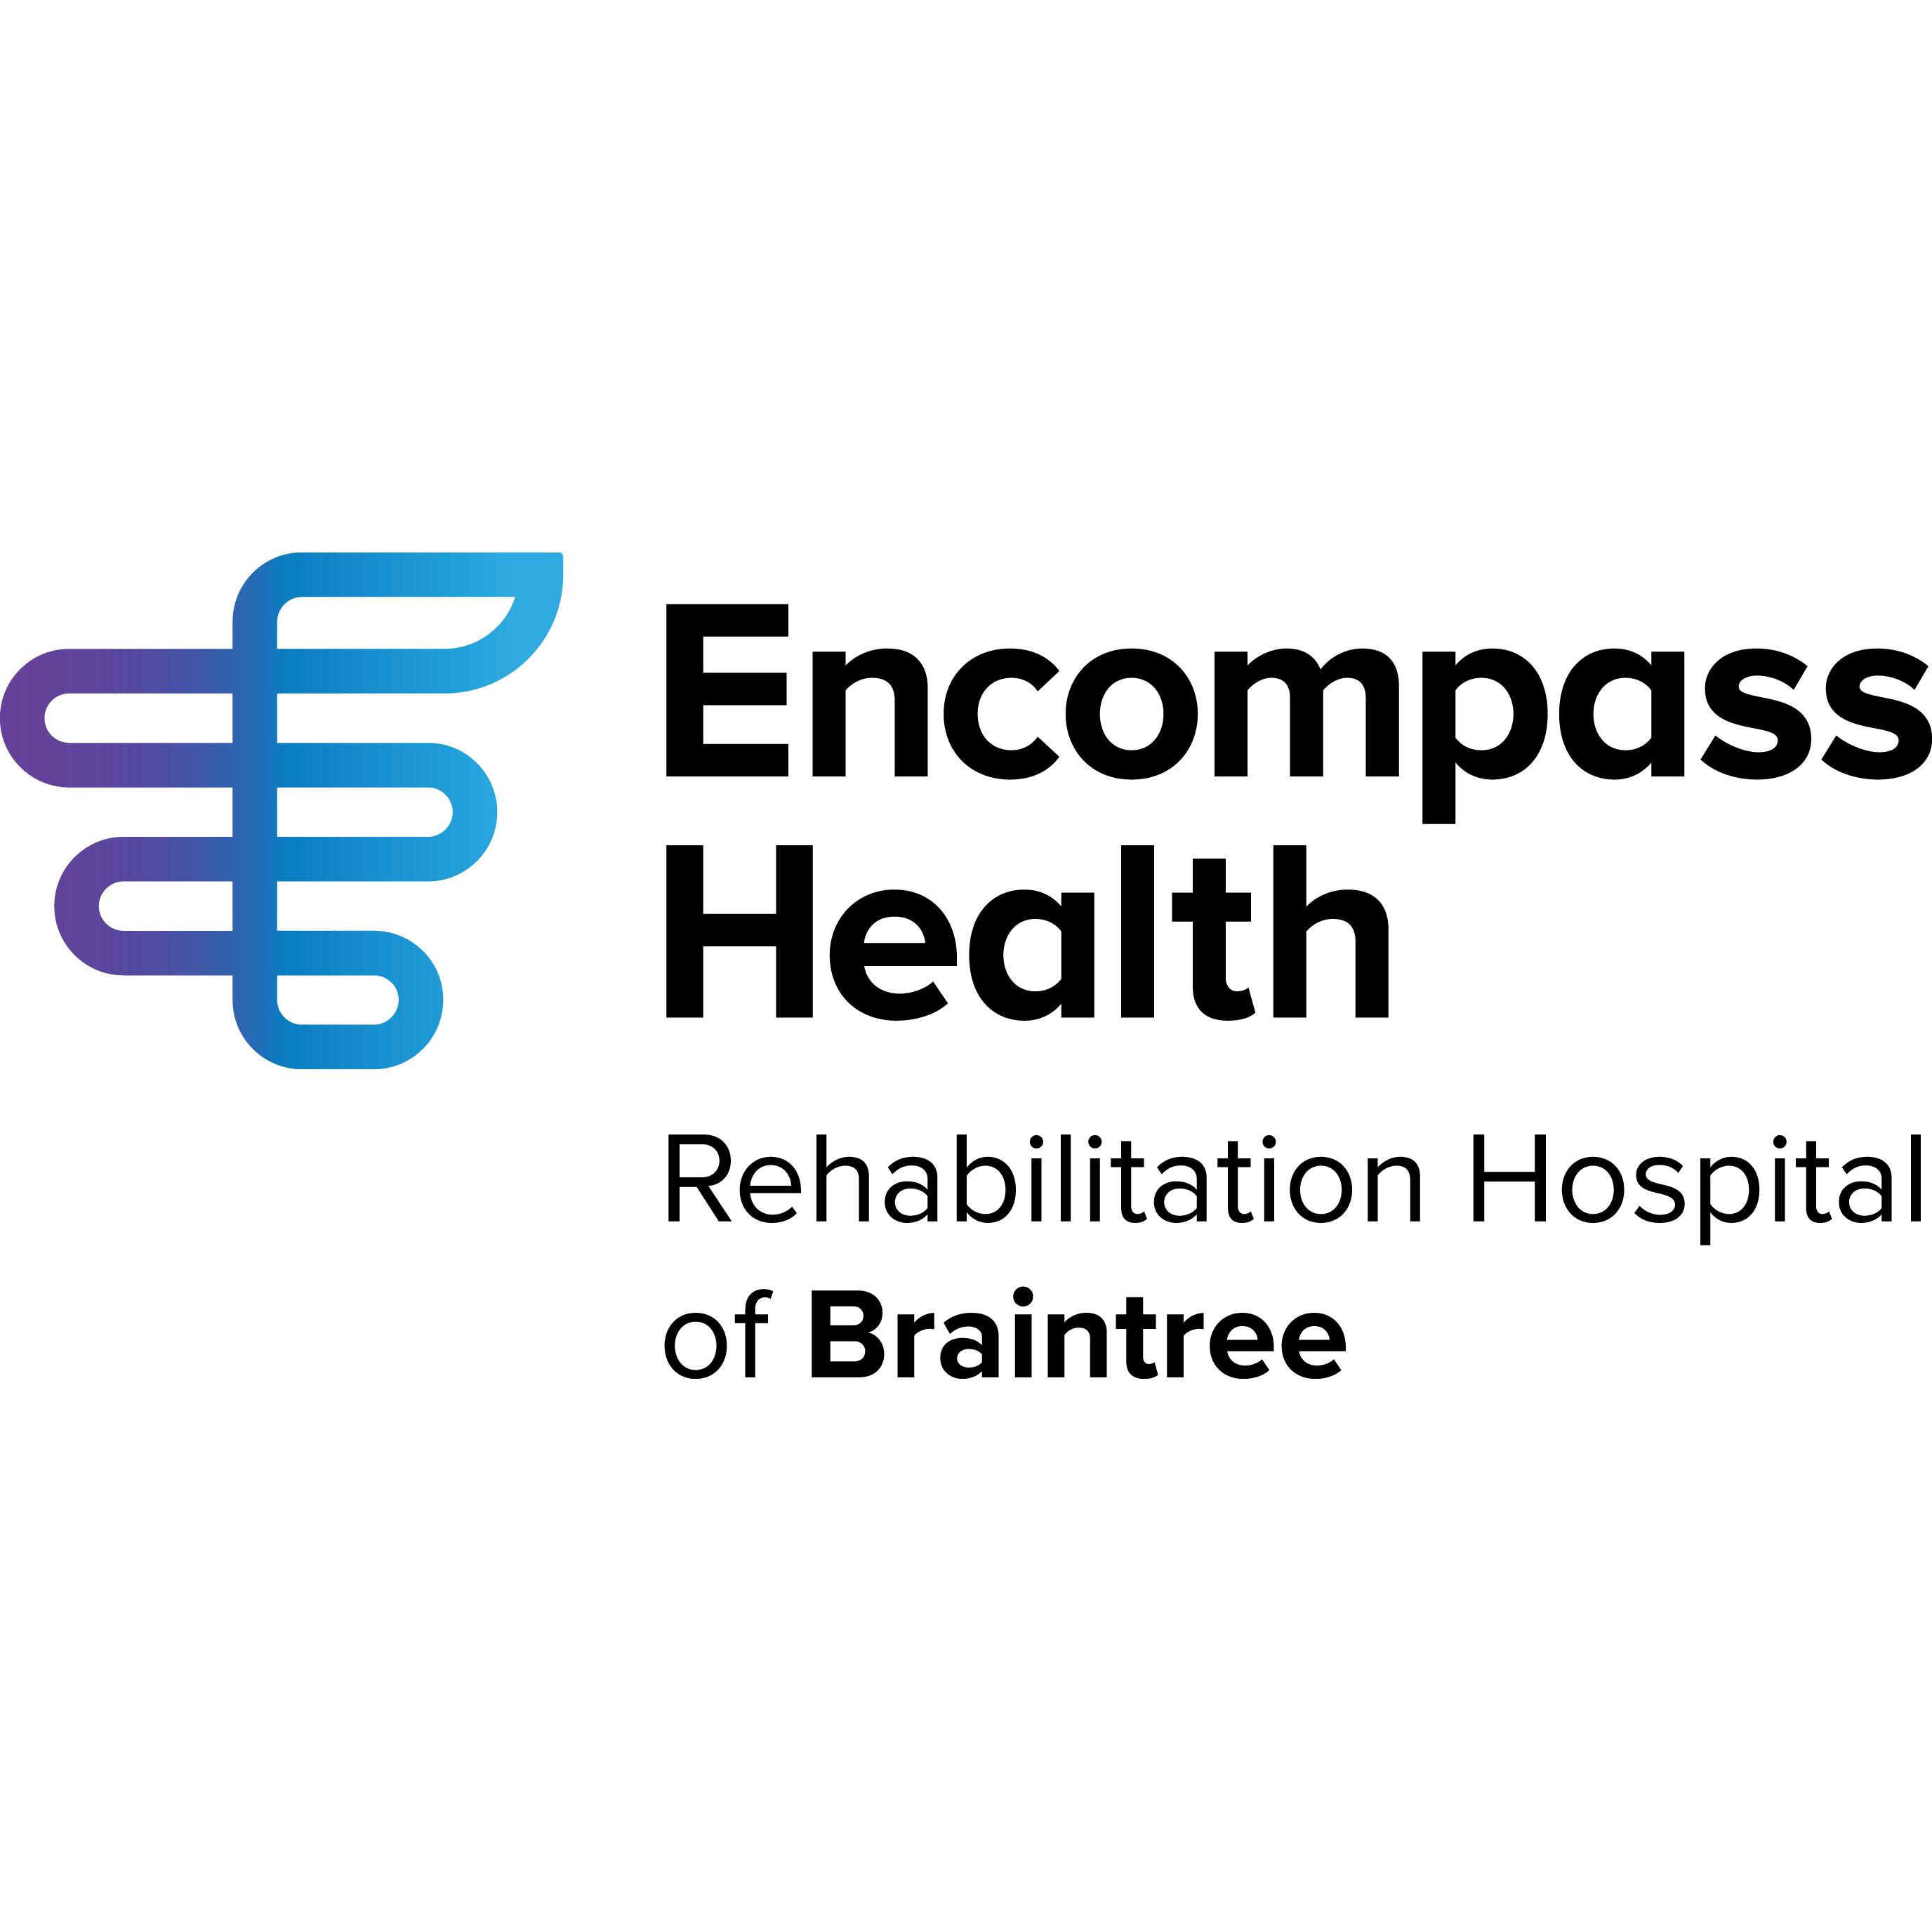 Encompass Health Rehabilitation Hospital of Braintree